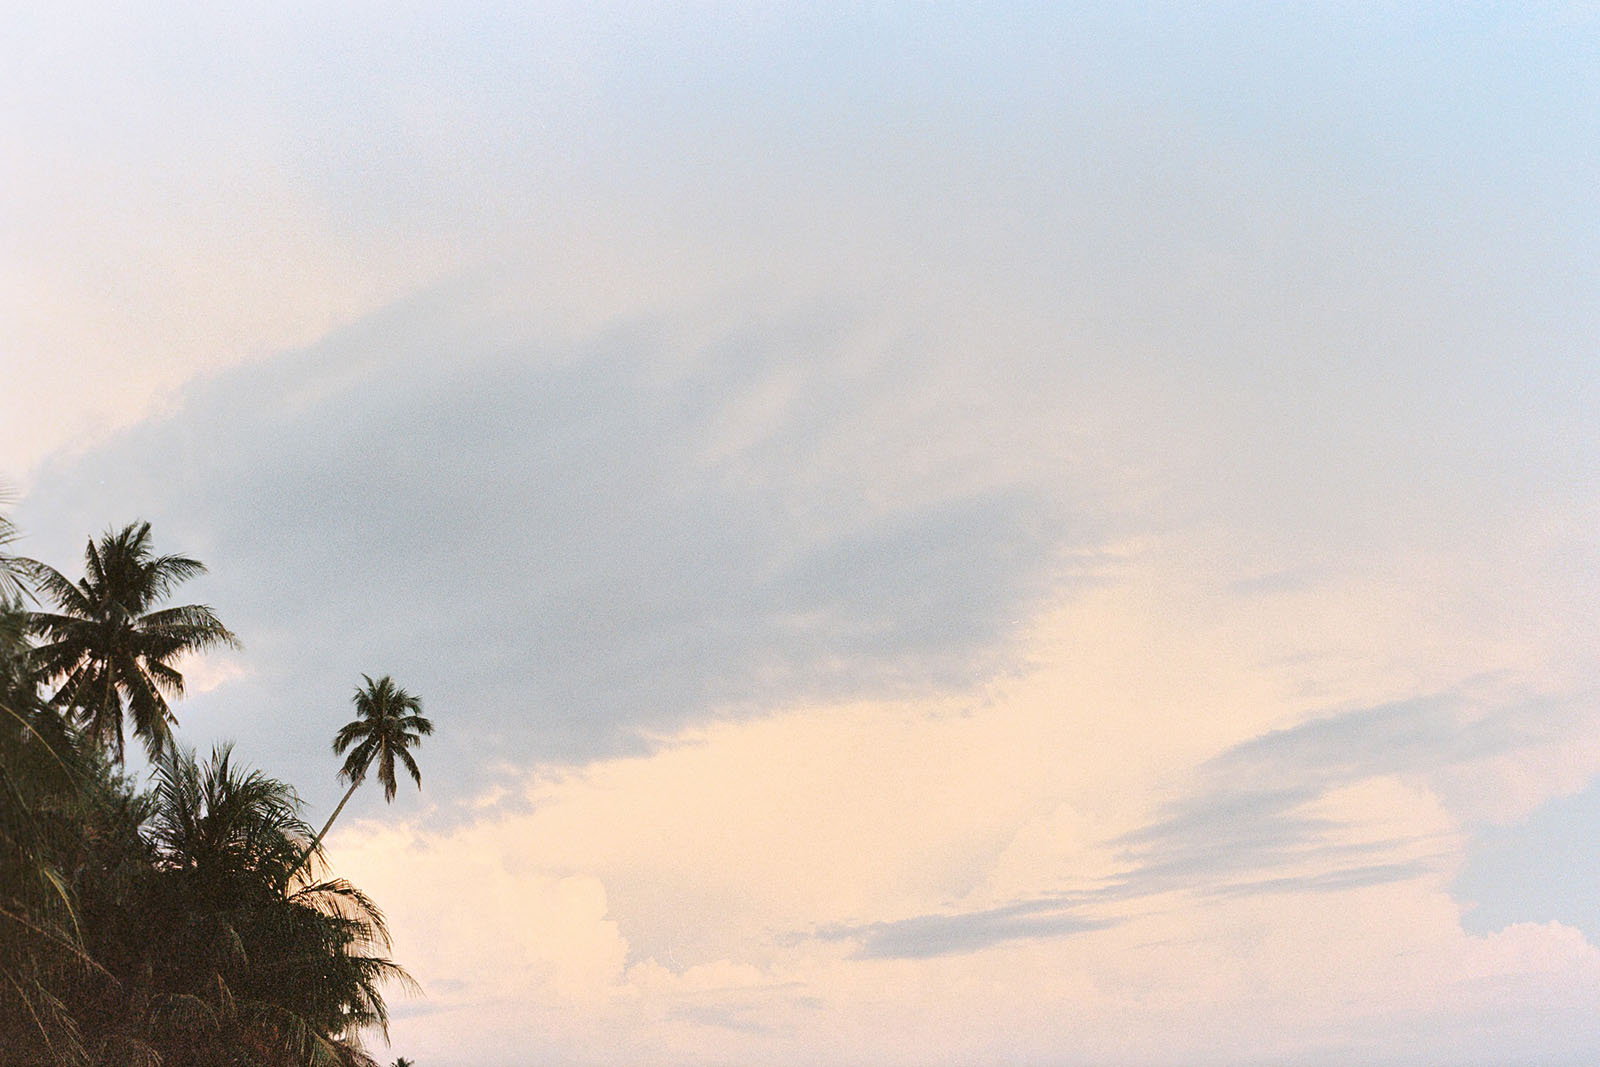 Palm trees at sunset on Koh Mak | Thailand Travel Photos